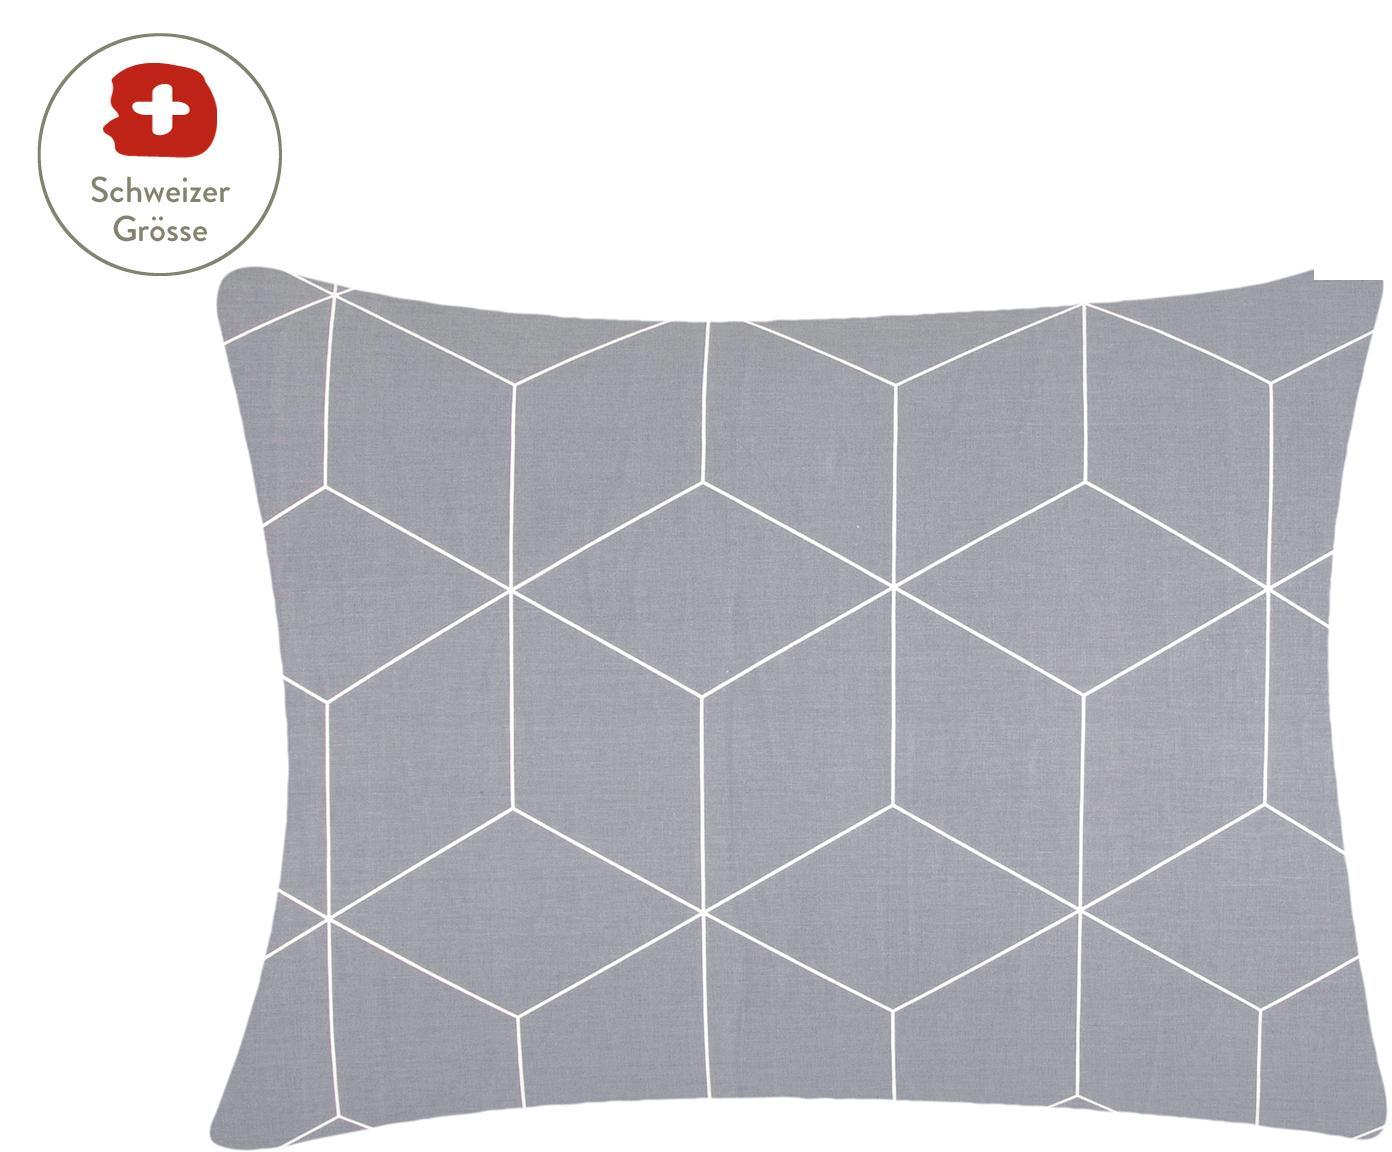 Baumwoll-Kissenbezug Lynn mit grafischem Muster, Webart: Renforcé Fadendichte 144 , Grau, Cremeweiss, 50 x 70 cm